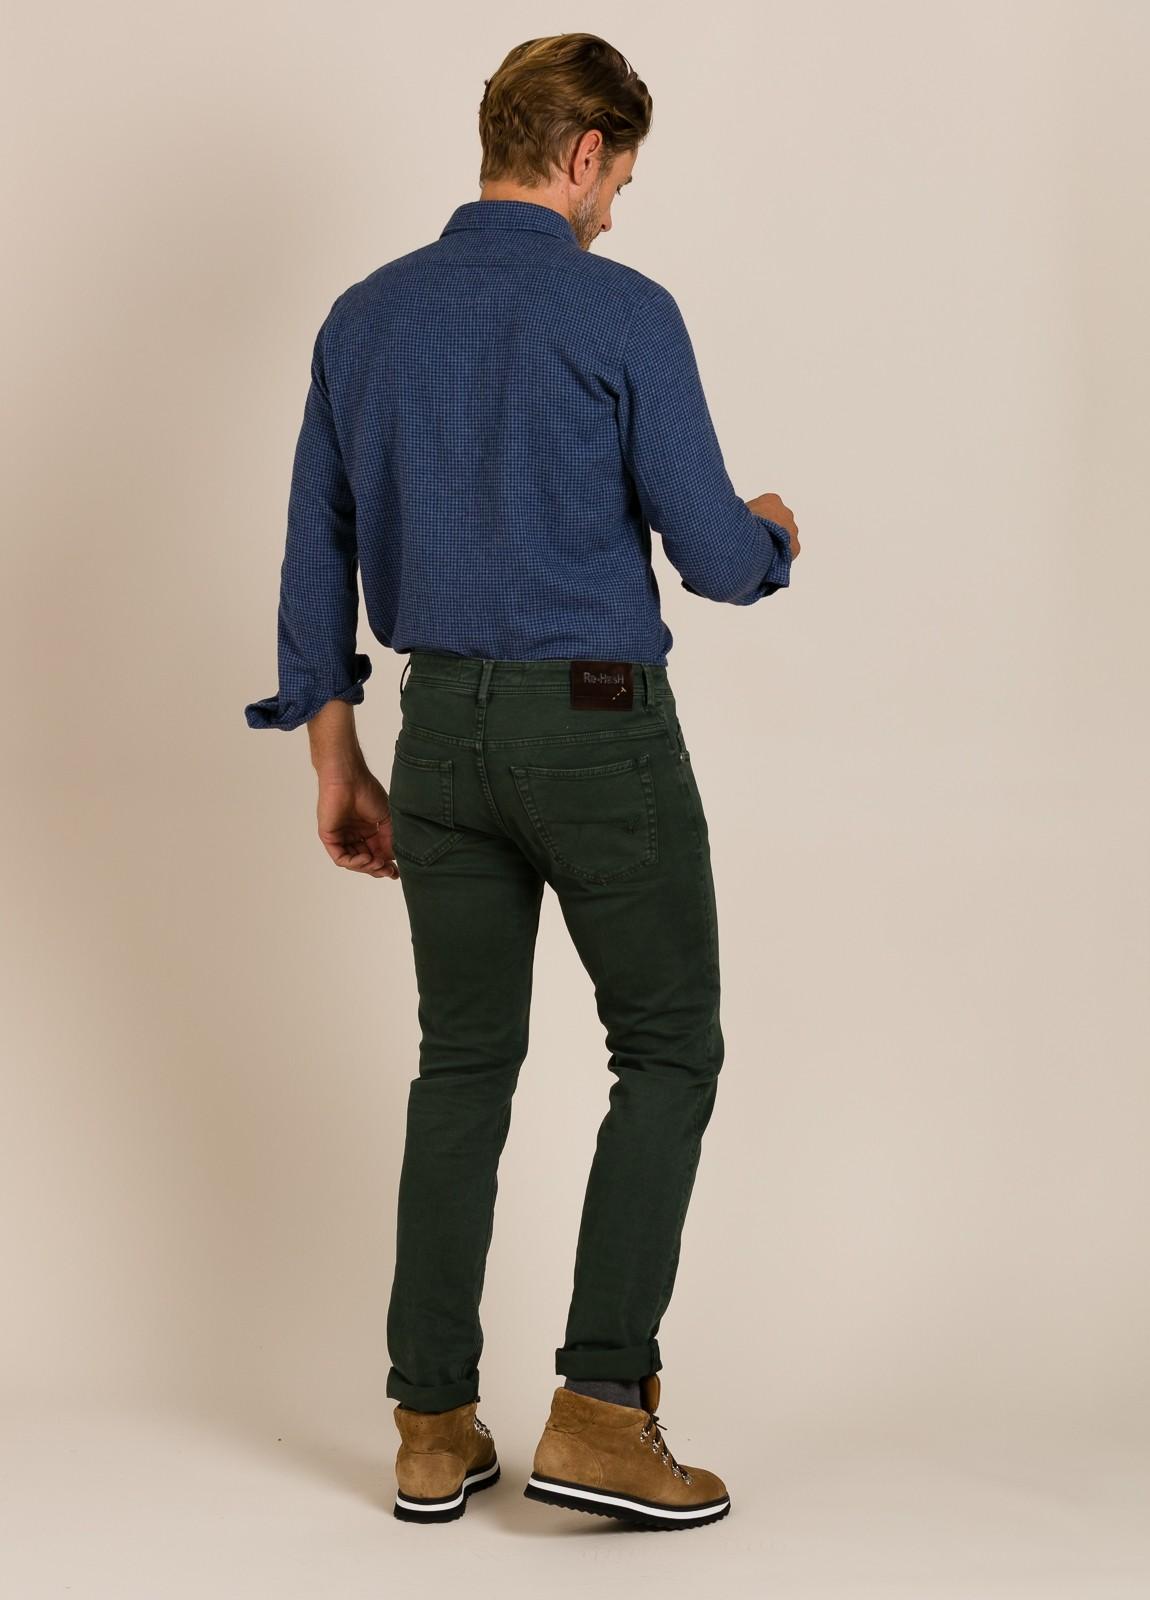 Camisa HARTFORD cuadros azul - Ítem3